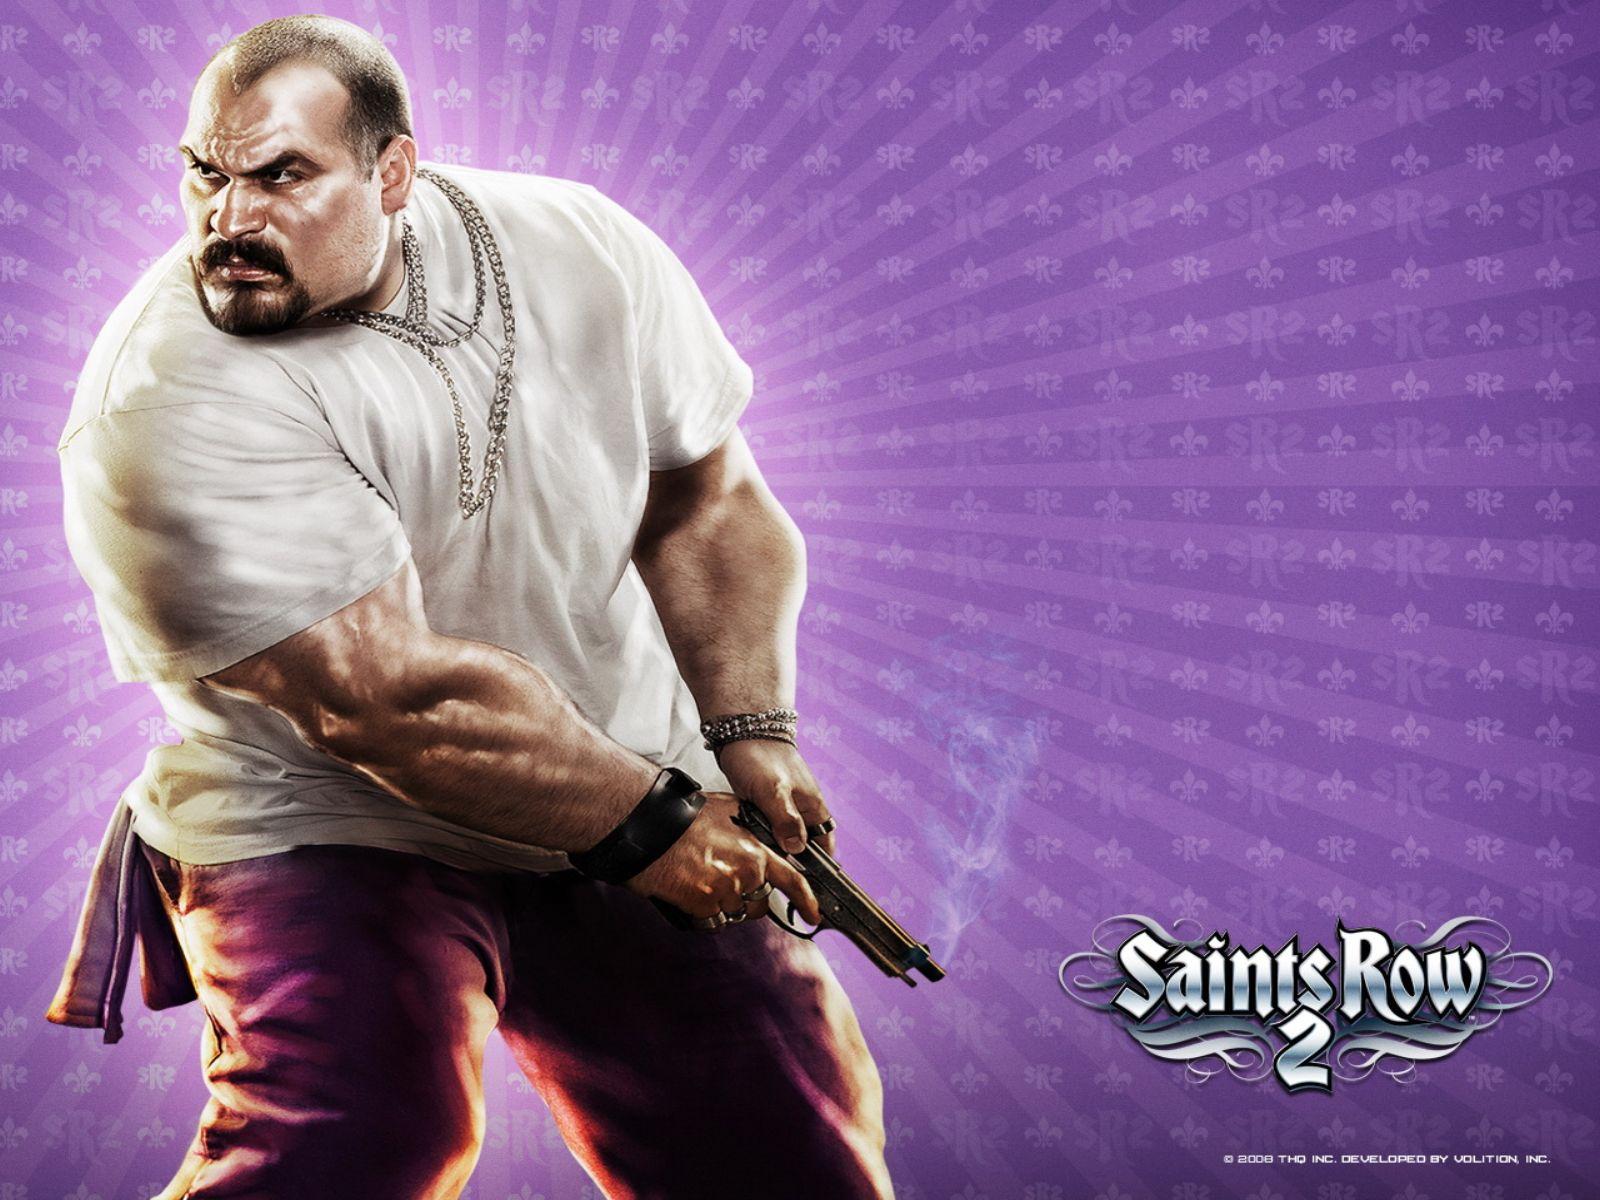 Hispanic Bulldog   Action Games Wallpaper Image featuring Saints Row 2 1600x1200